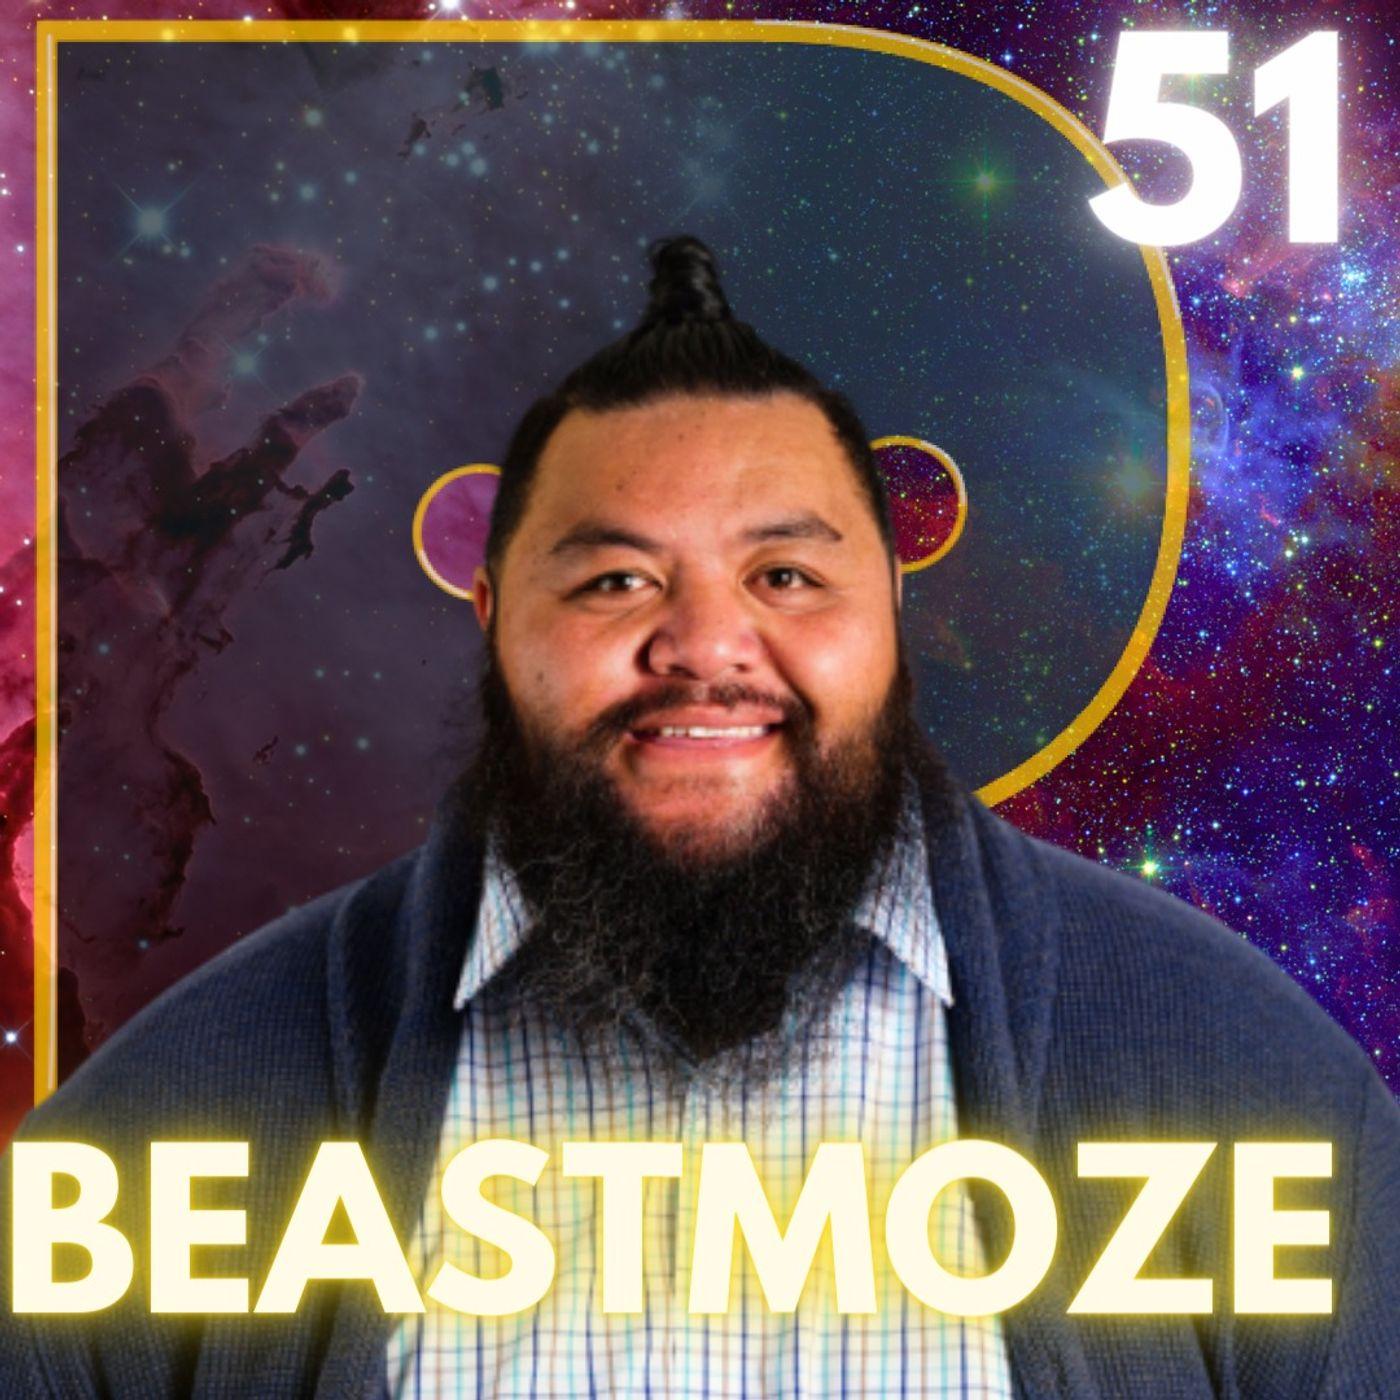 King Movement with BeastMoze